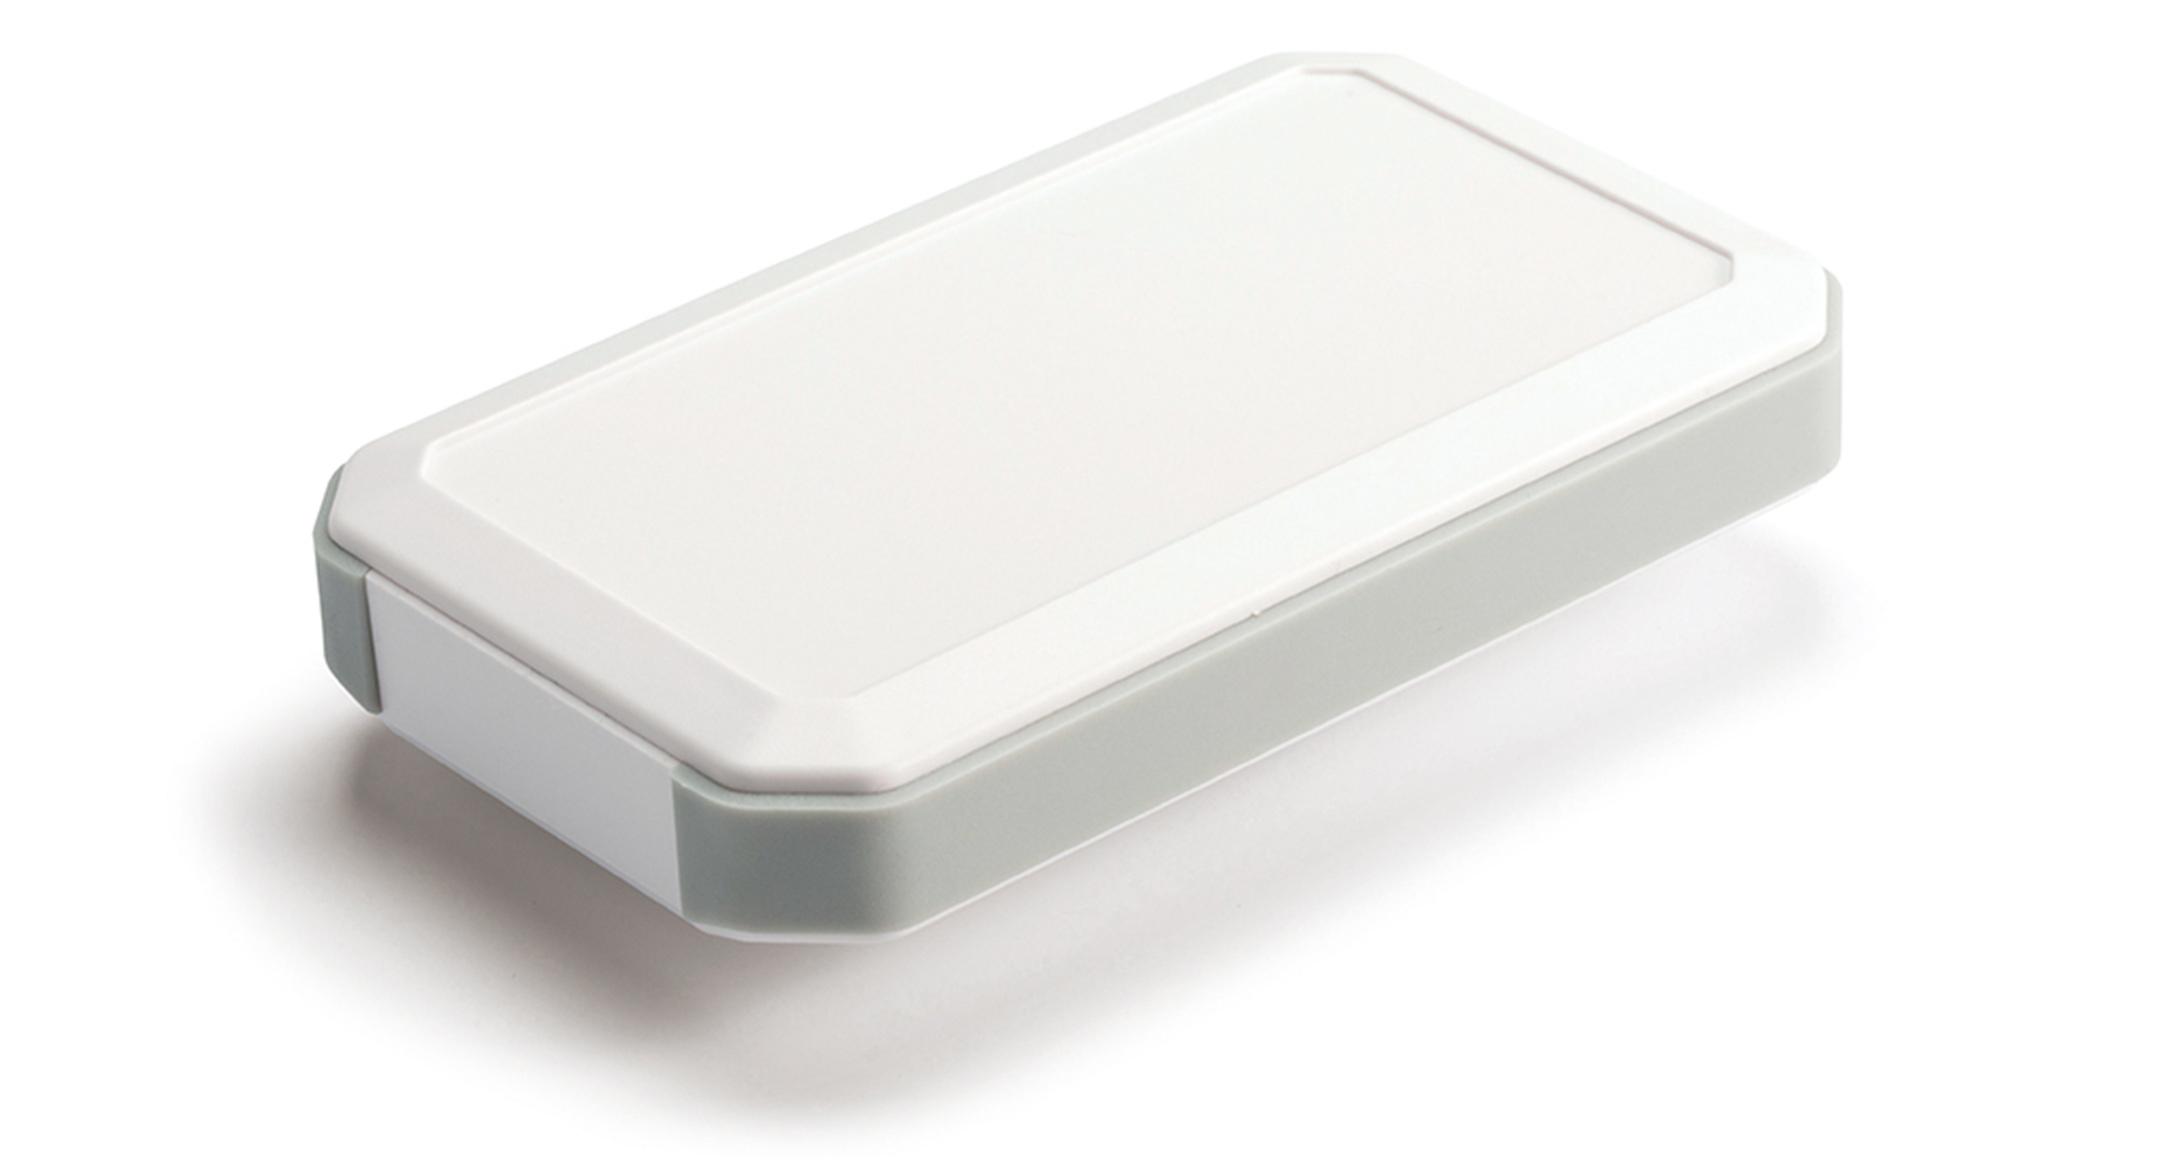 IP67 HANDHELD PLASTIC ENCLOSURE - WH series:Off-white/Light gray